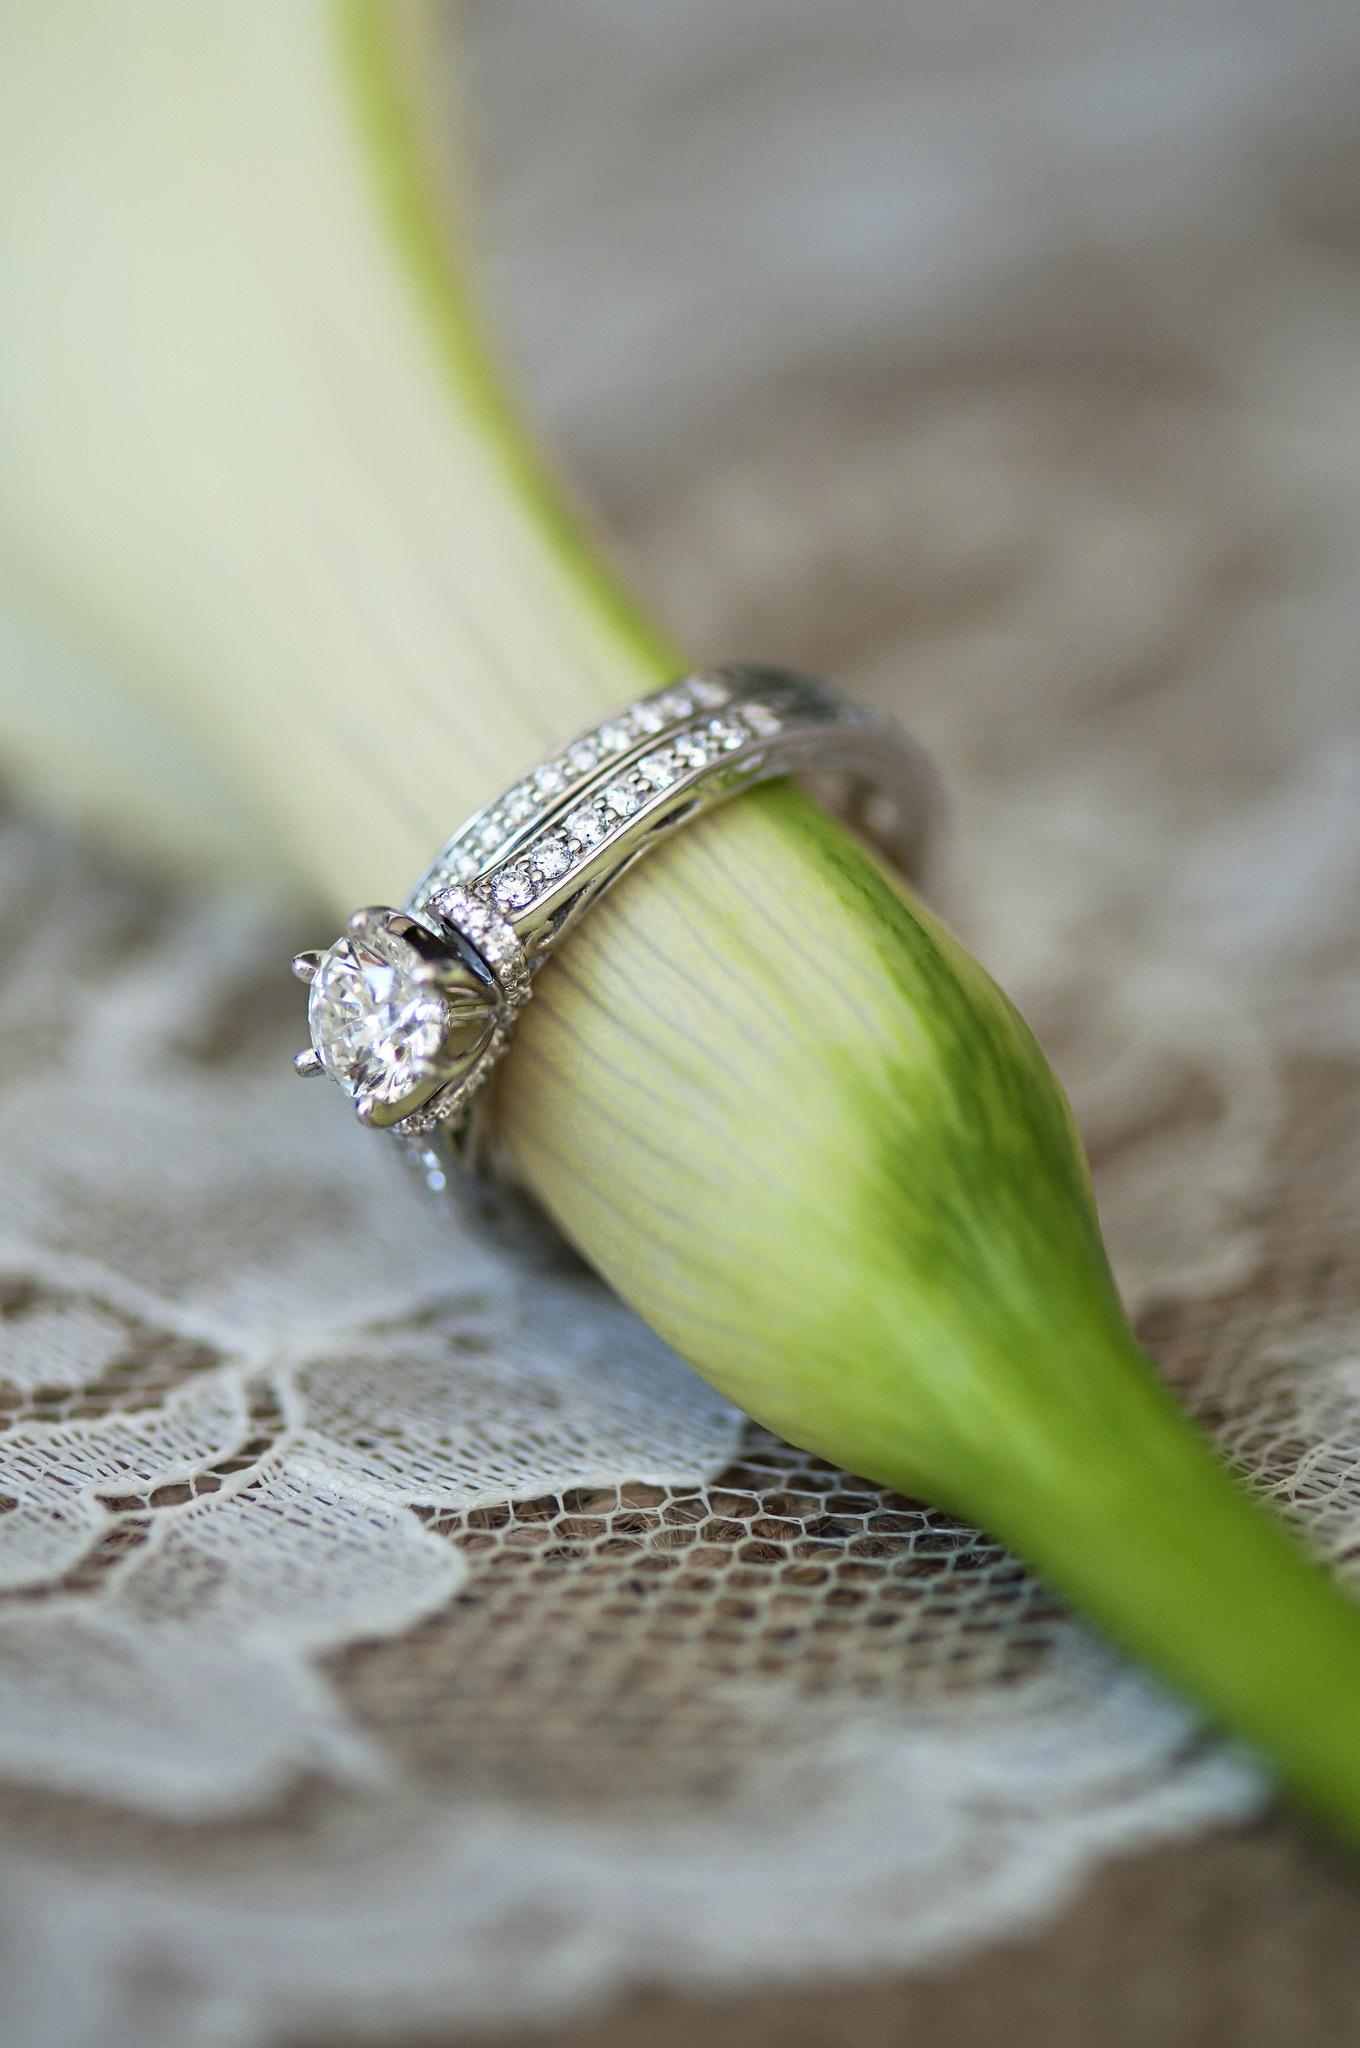 kristine_wedding_rings_spiritedtable_photo01.jpg